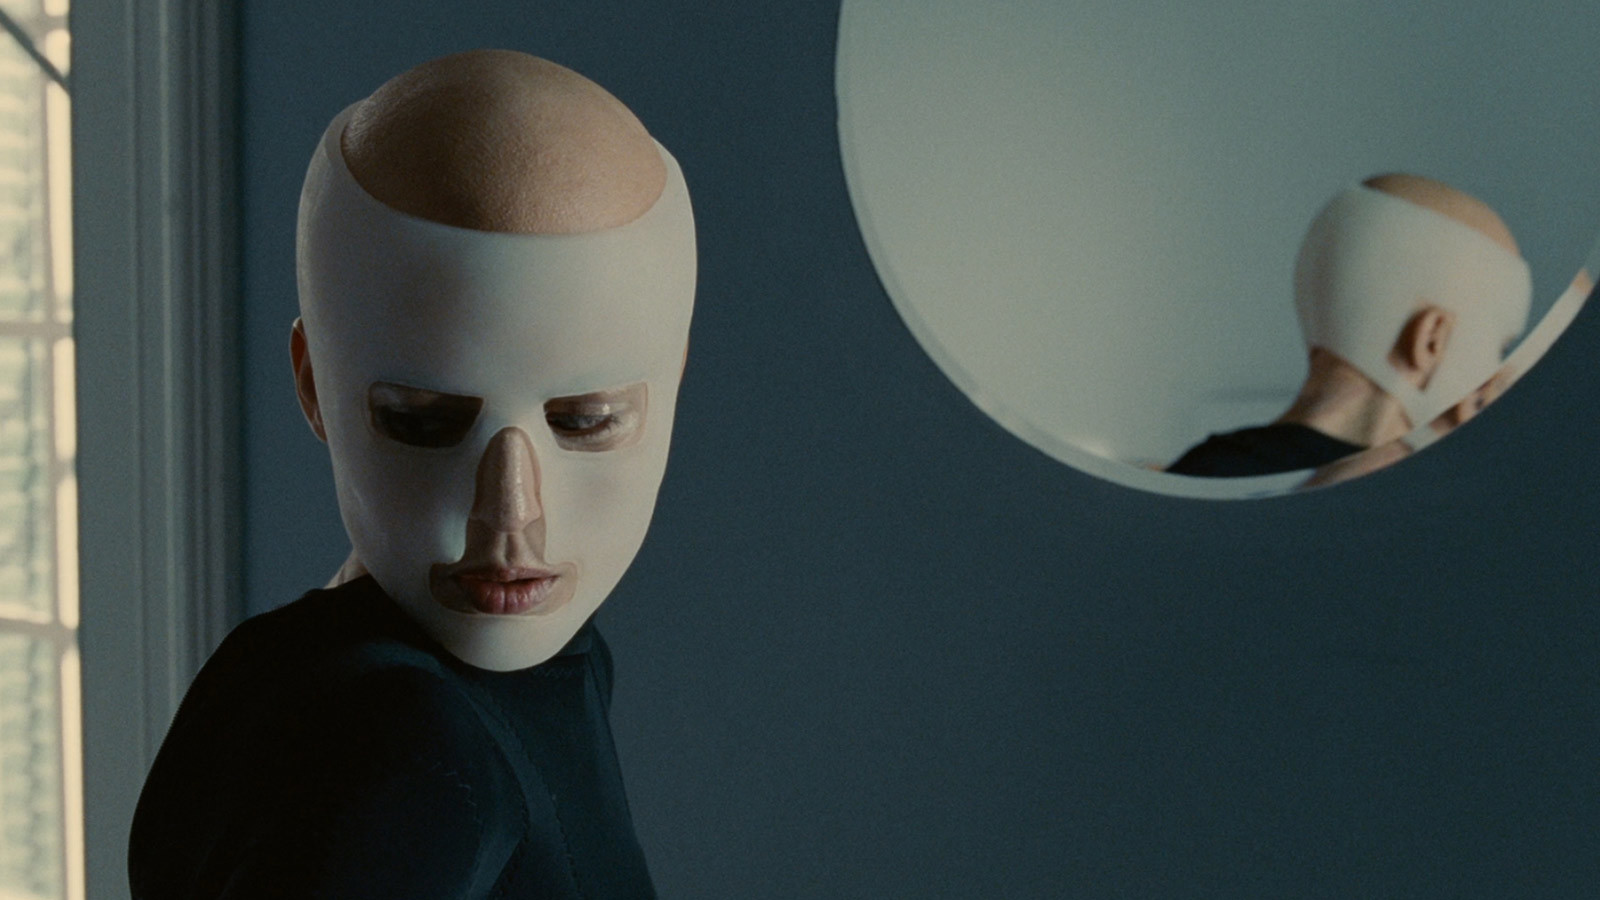 Films in London today: THE SKIN I LIVE IN at Deptford Cinema (10 FEB).